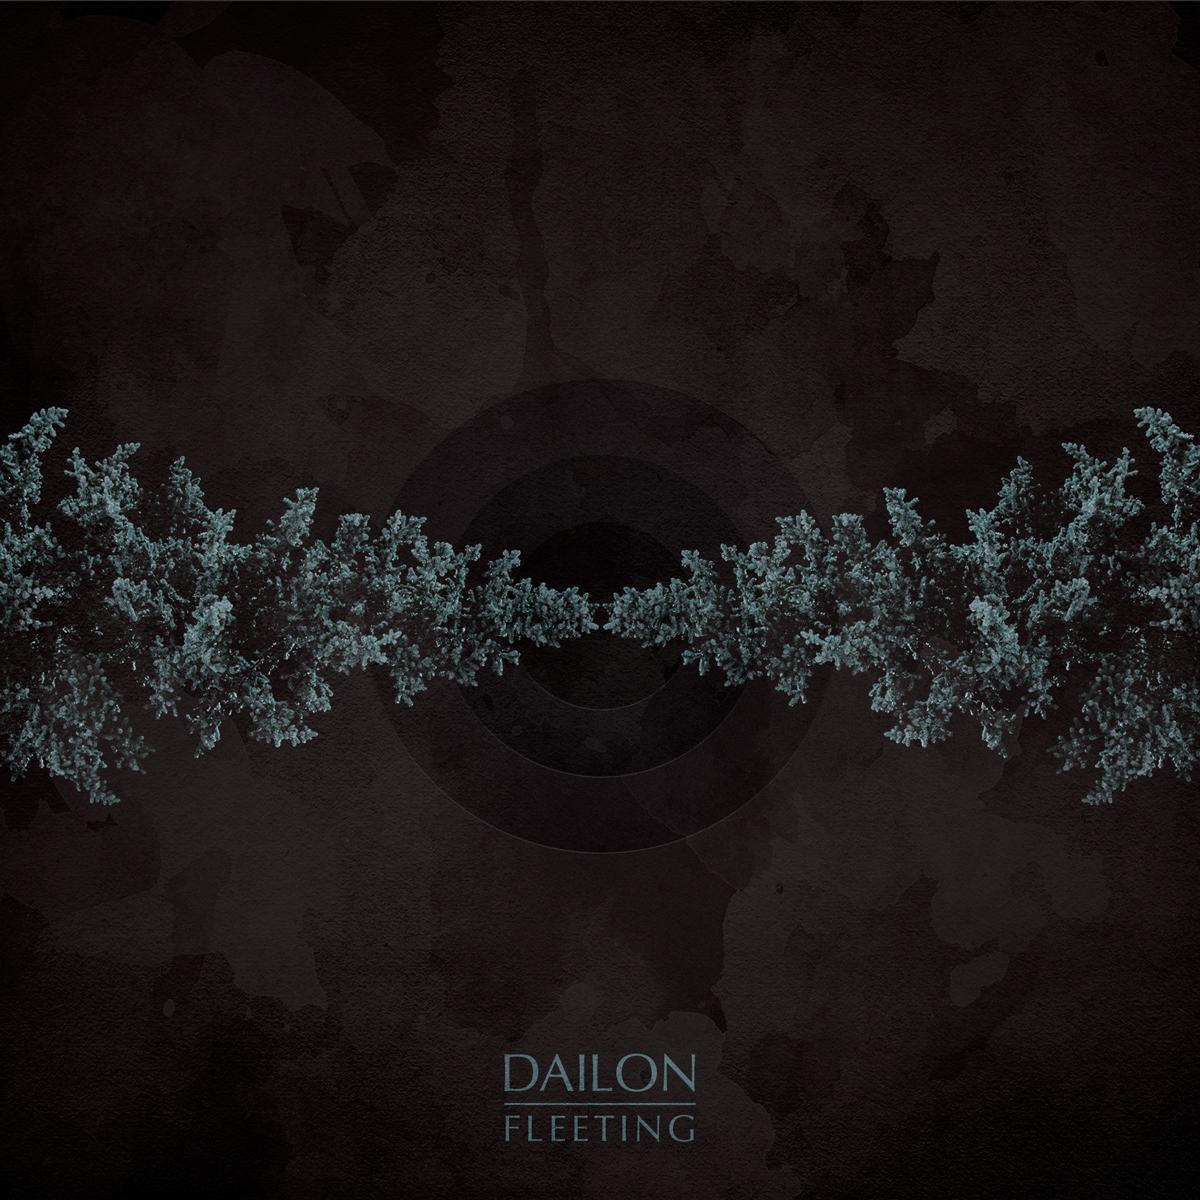 DAILON - FLEETING